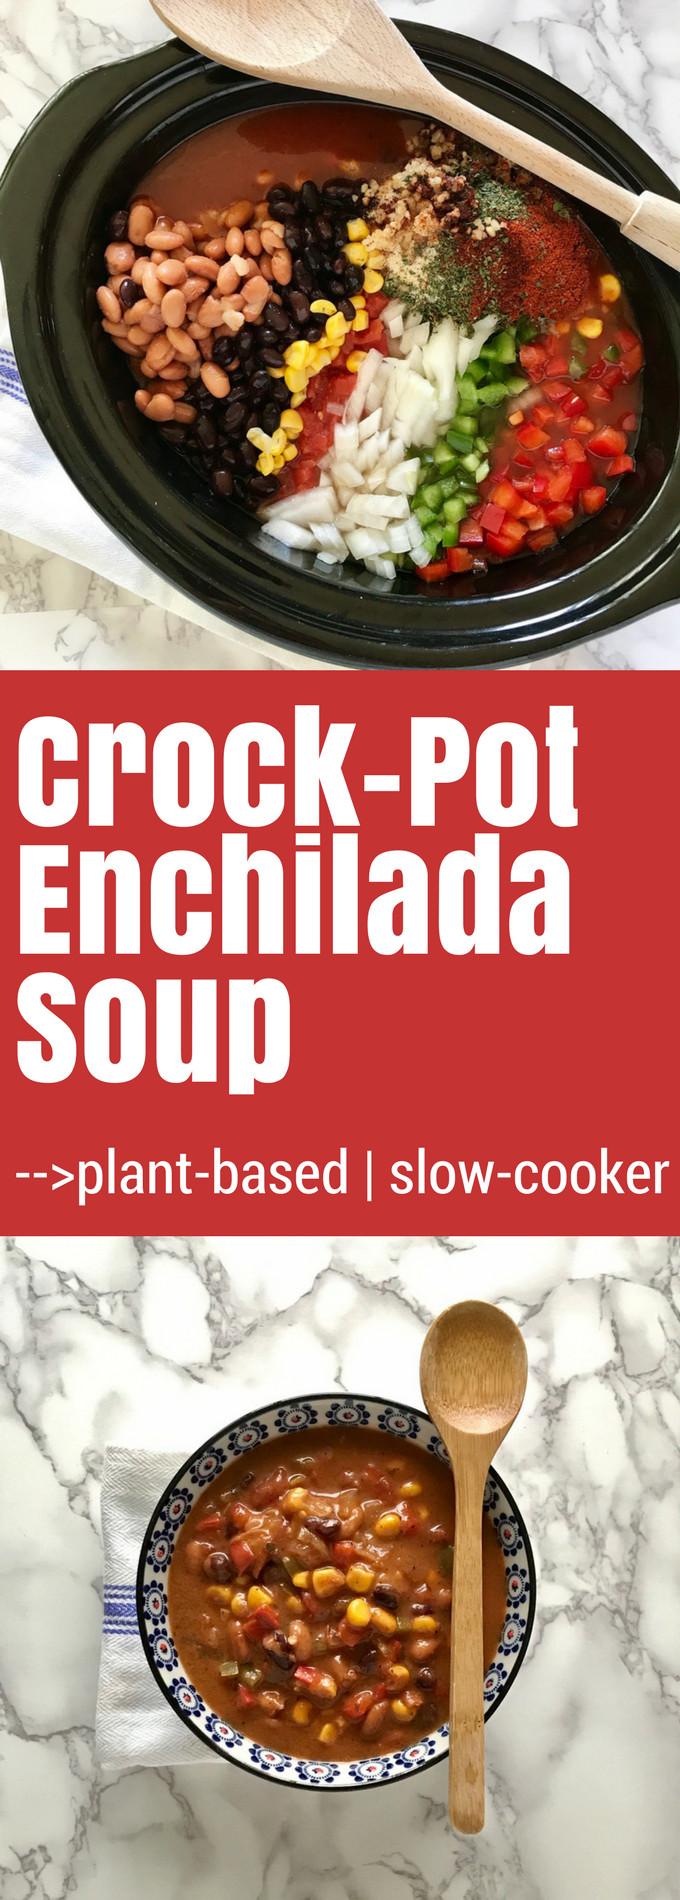 Crockpot Plant Based Recipes  Plant based Crock Pot Enchilada Soup Recipe